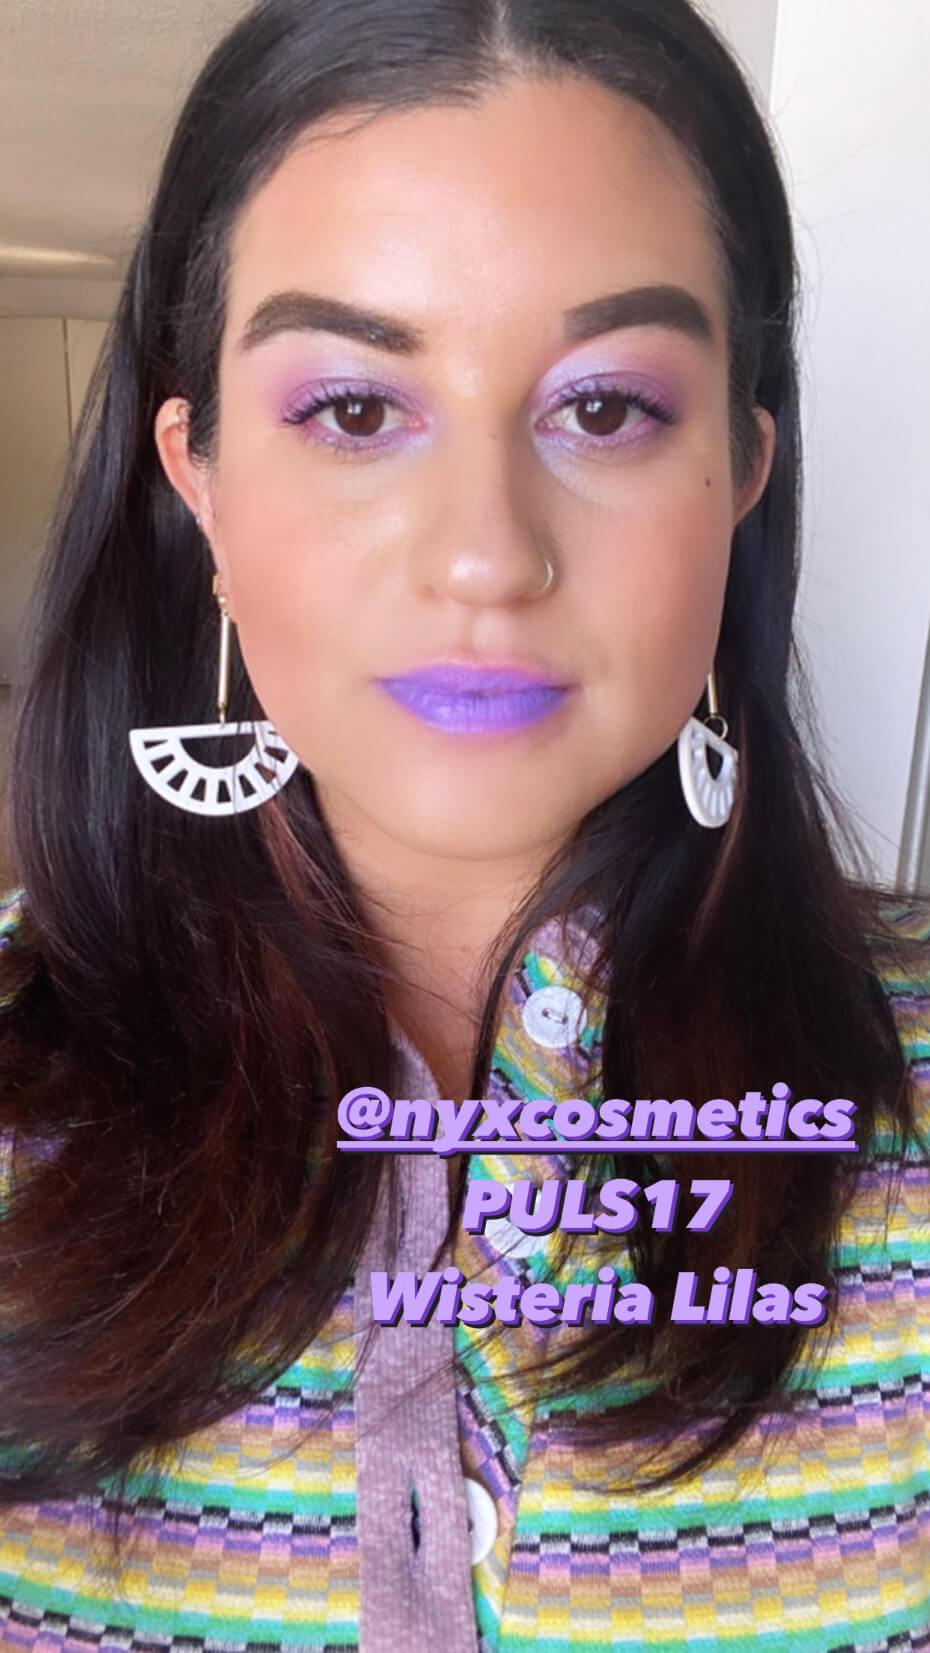 purple-lipsticks-nyx-cosmetics-wisteria-lilas-050520